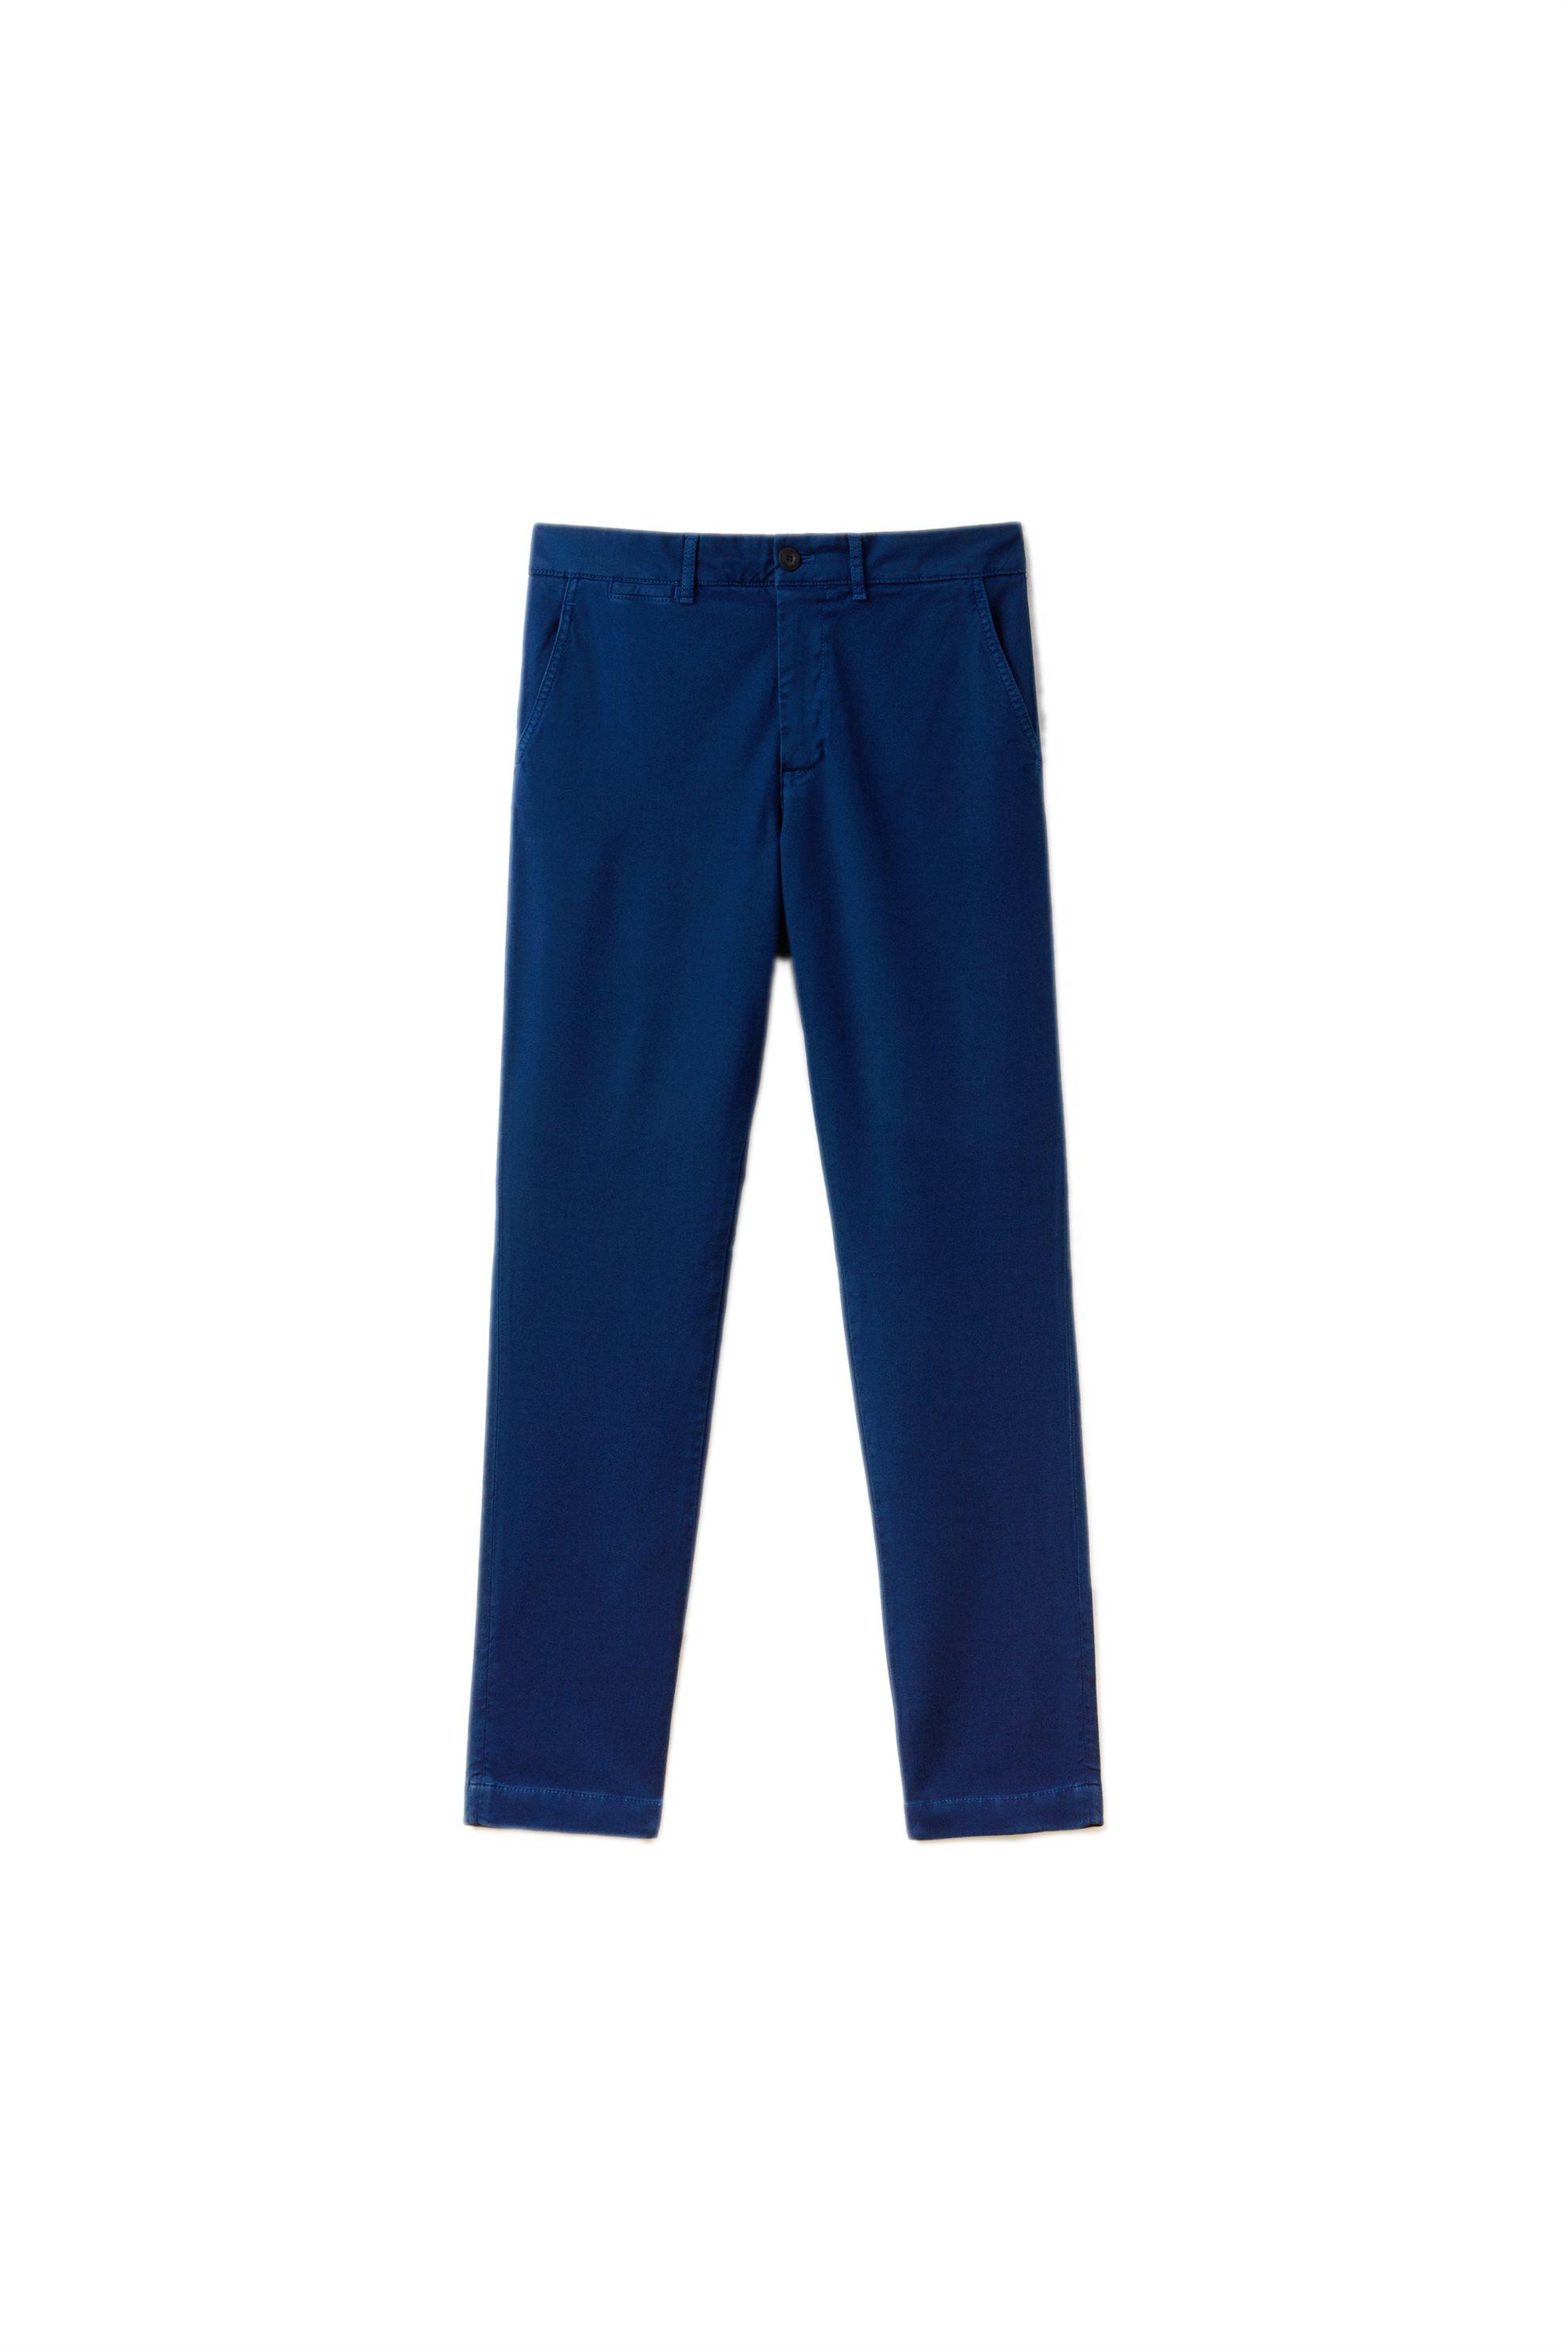 4d2b976d3b56 Notos Ανδρικό παντελόνι chino μονόχρωμο Modern Heritage Collection Lacoste  - HH4663 - Μπλε Ηλεκτρίκ